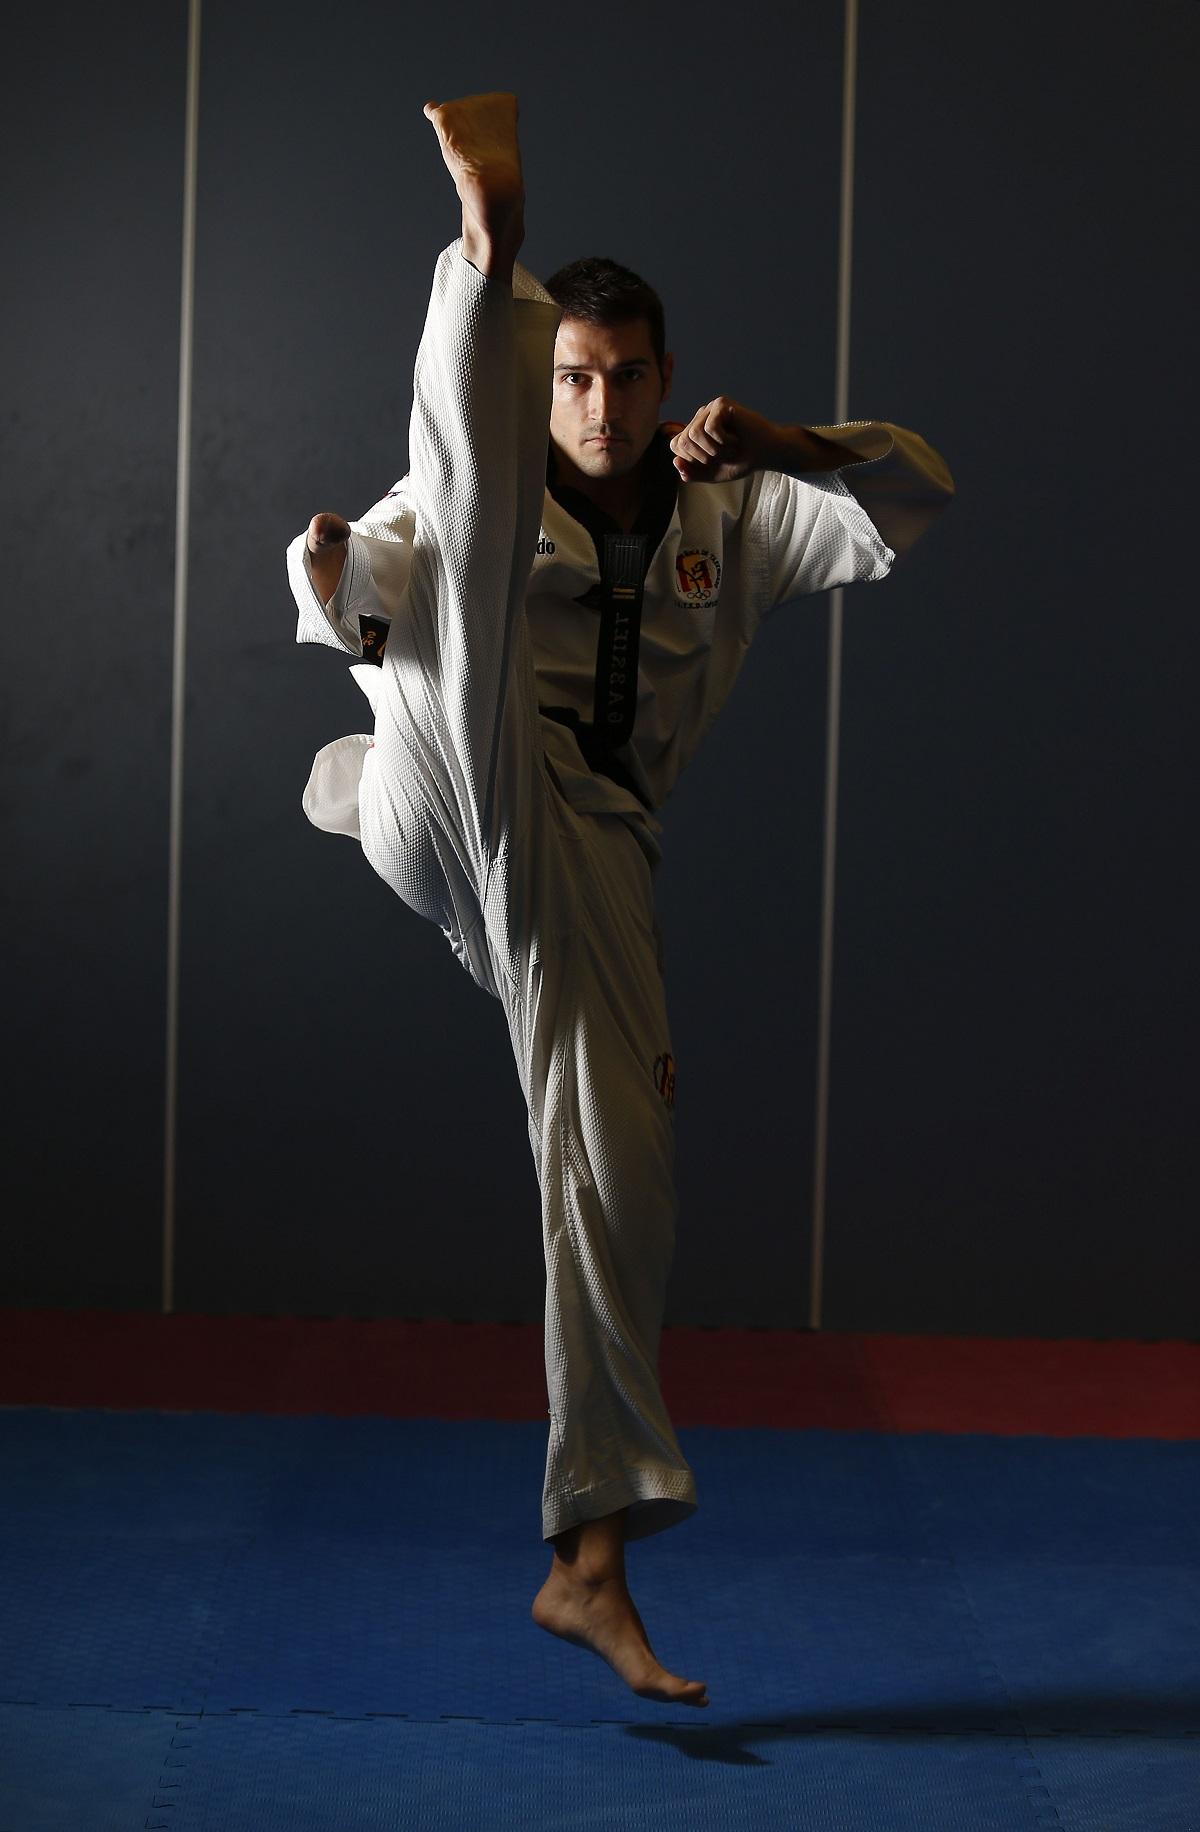 Gabriel Amado, TAEKWONDO PARALIMPICO